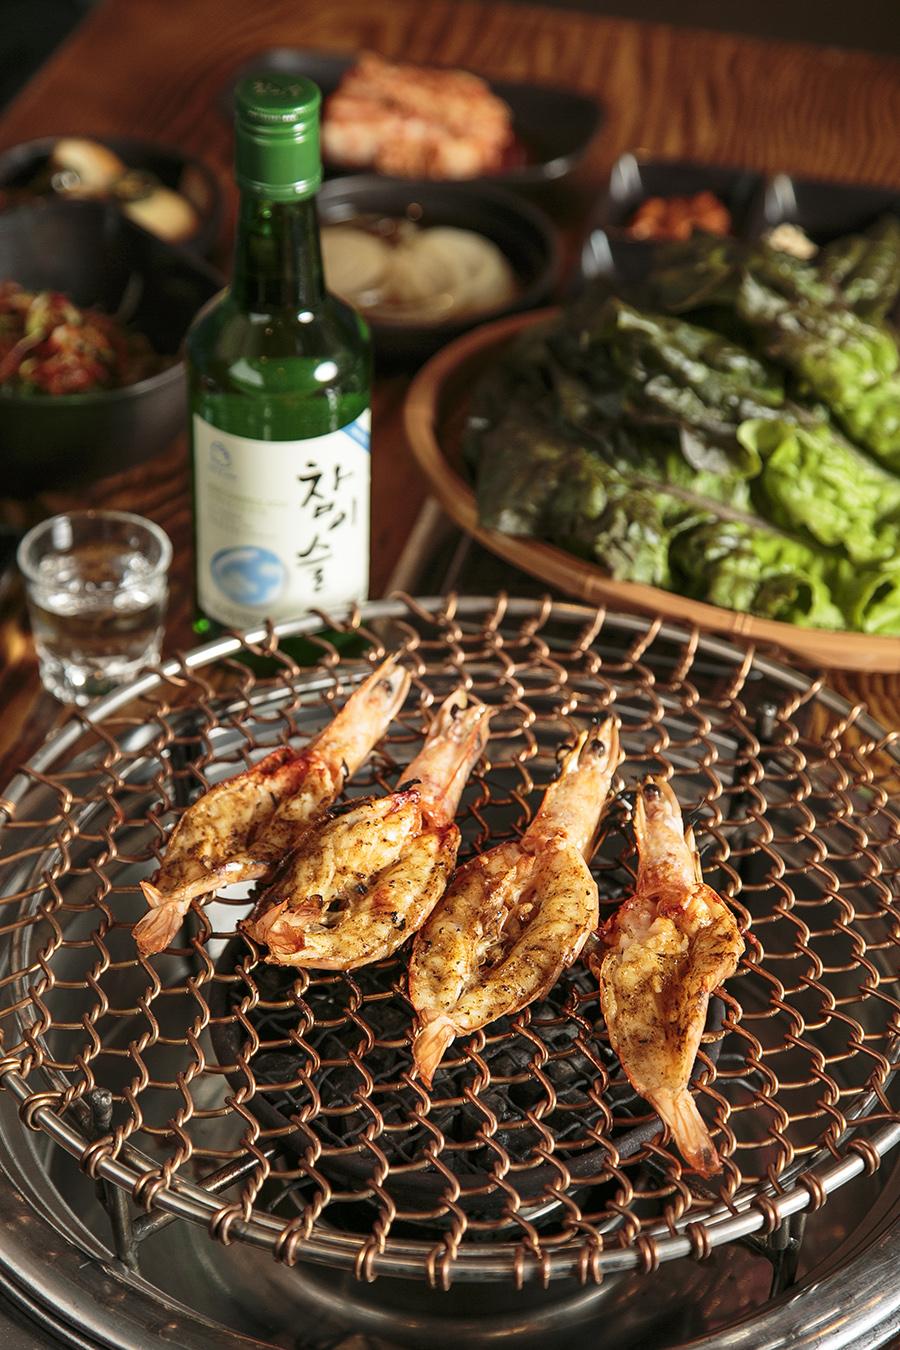 Shrimp and soju. (Samira Bouaou/Epoch Times)